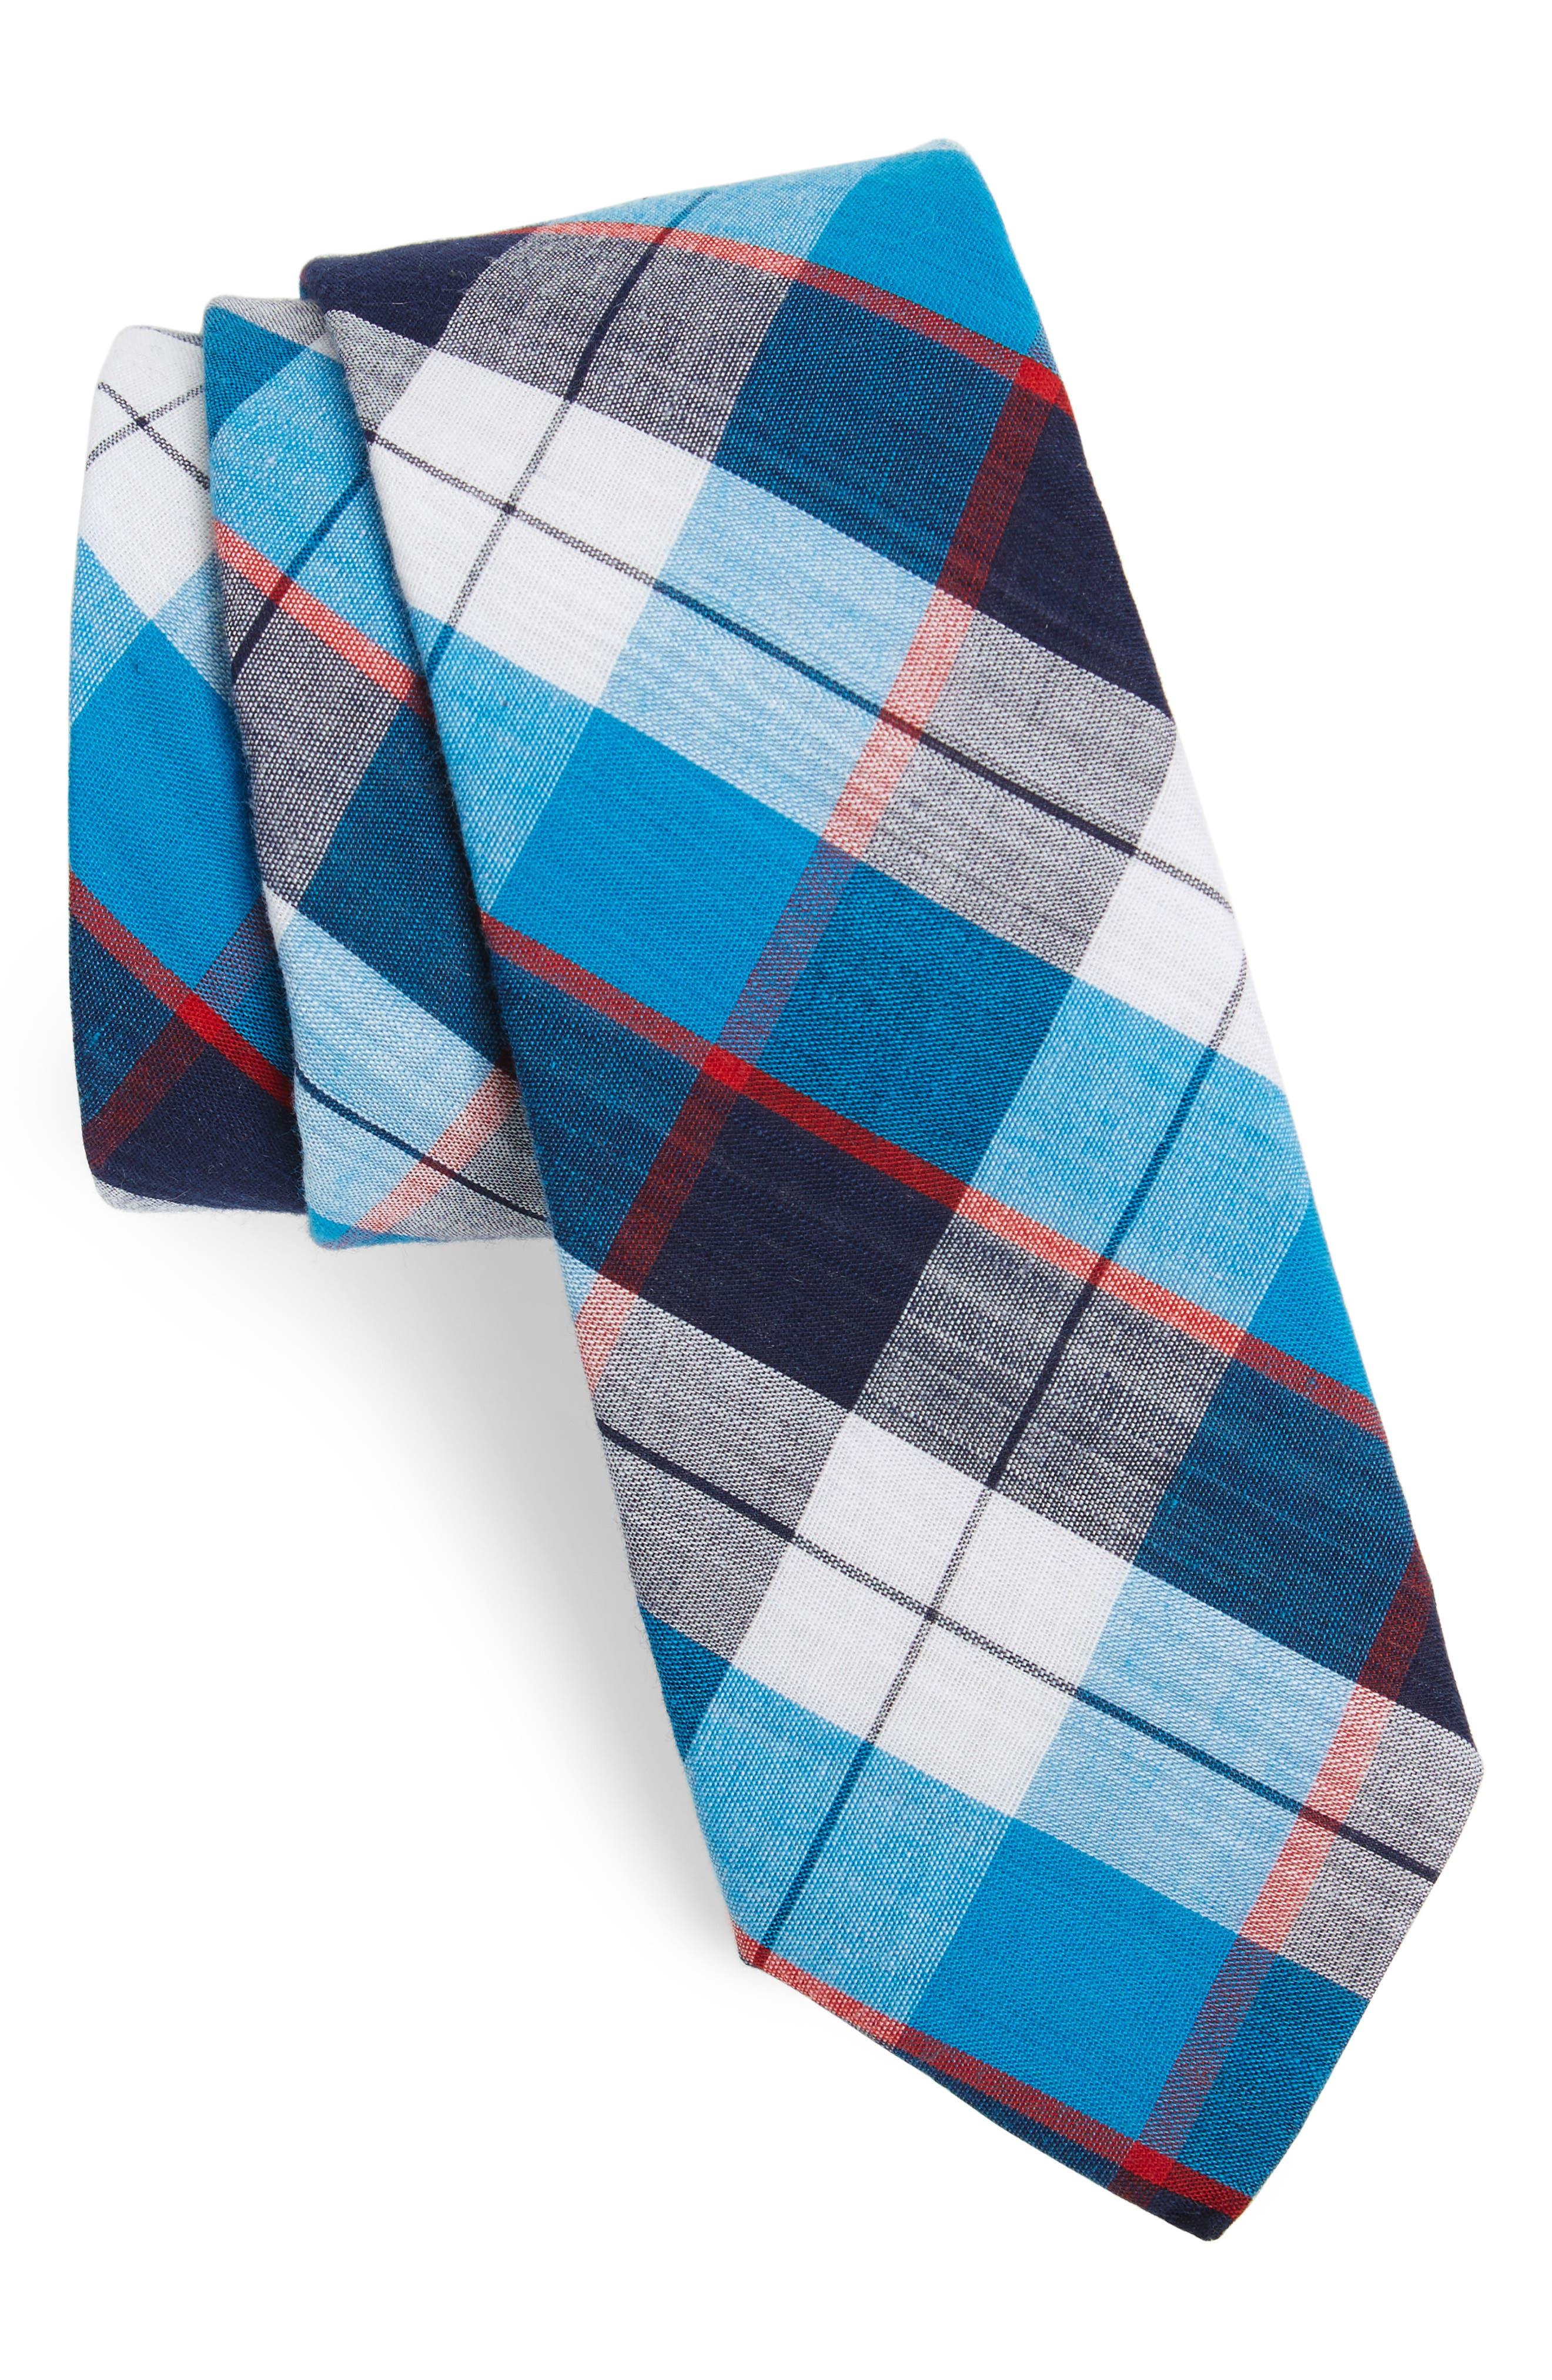 Main Image - Nordstrom Men's Shop Esterbrook Plaid Cotton Skinny Tie